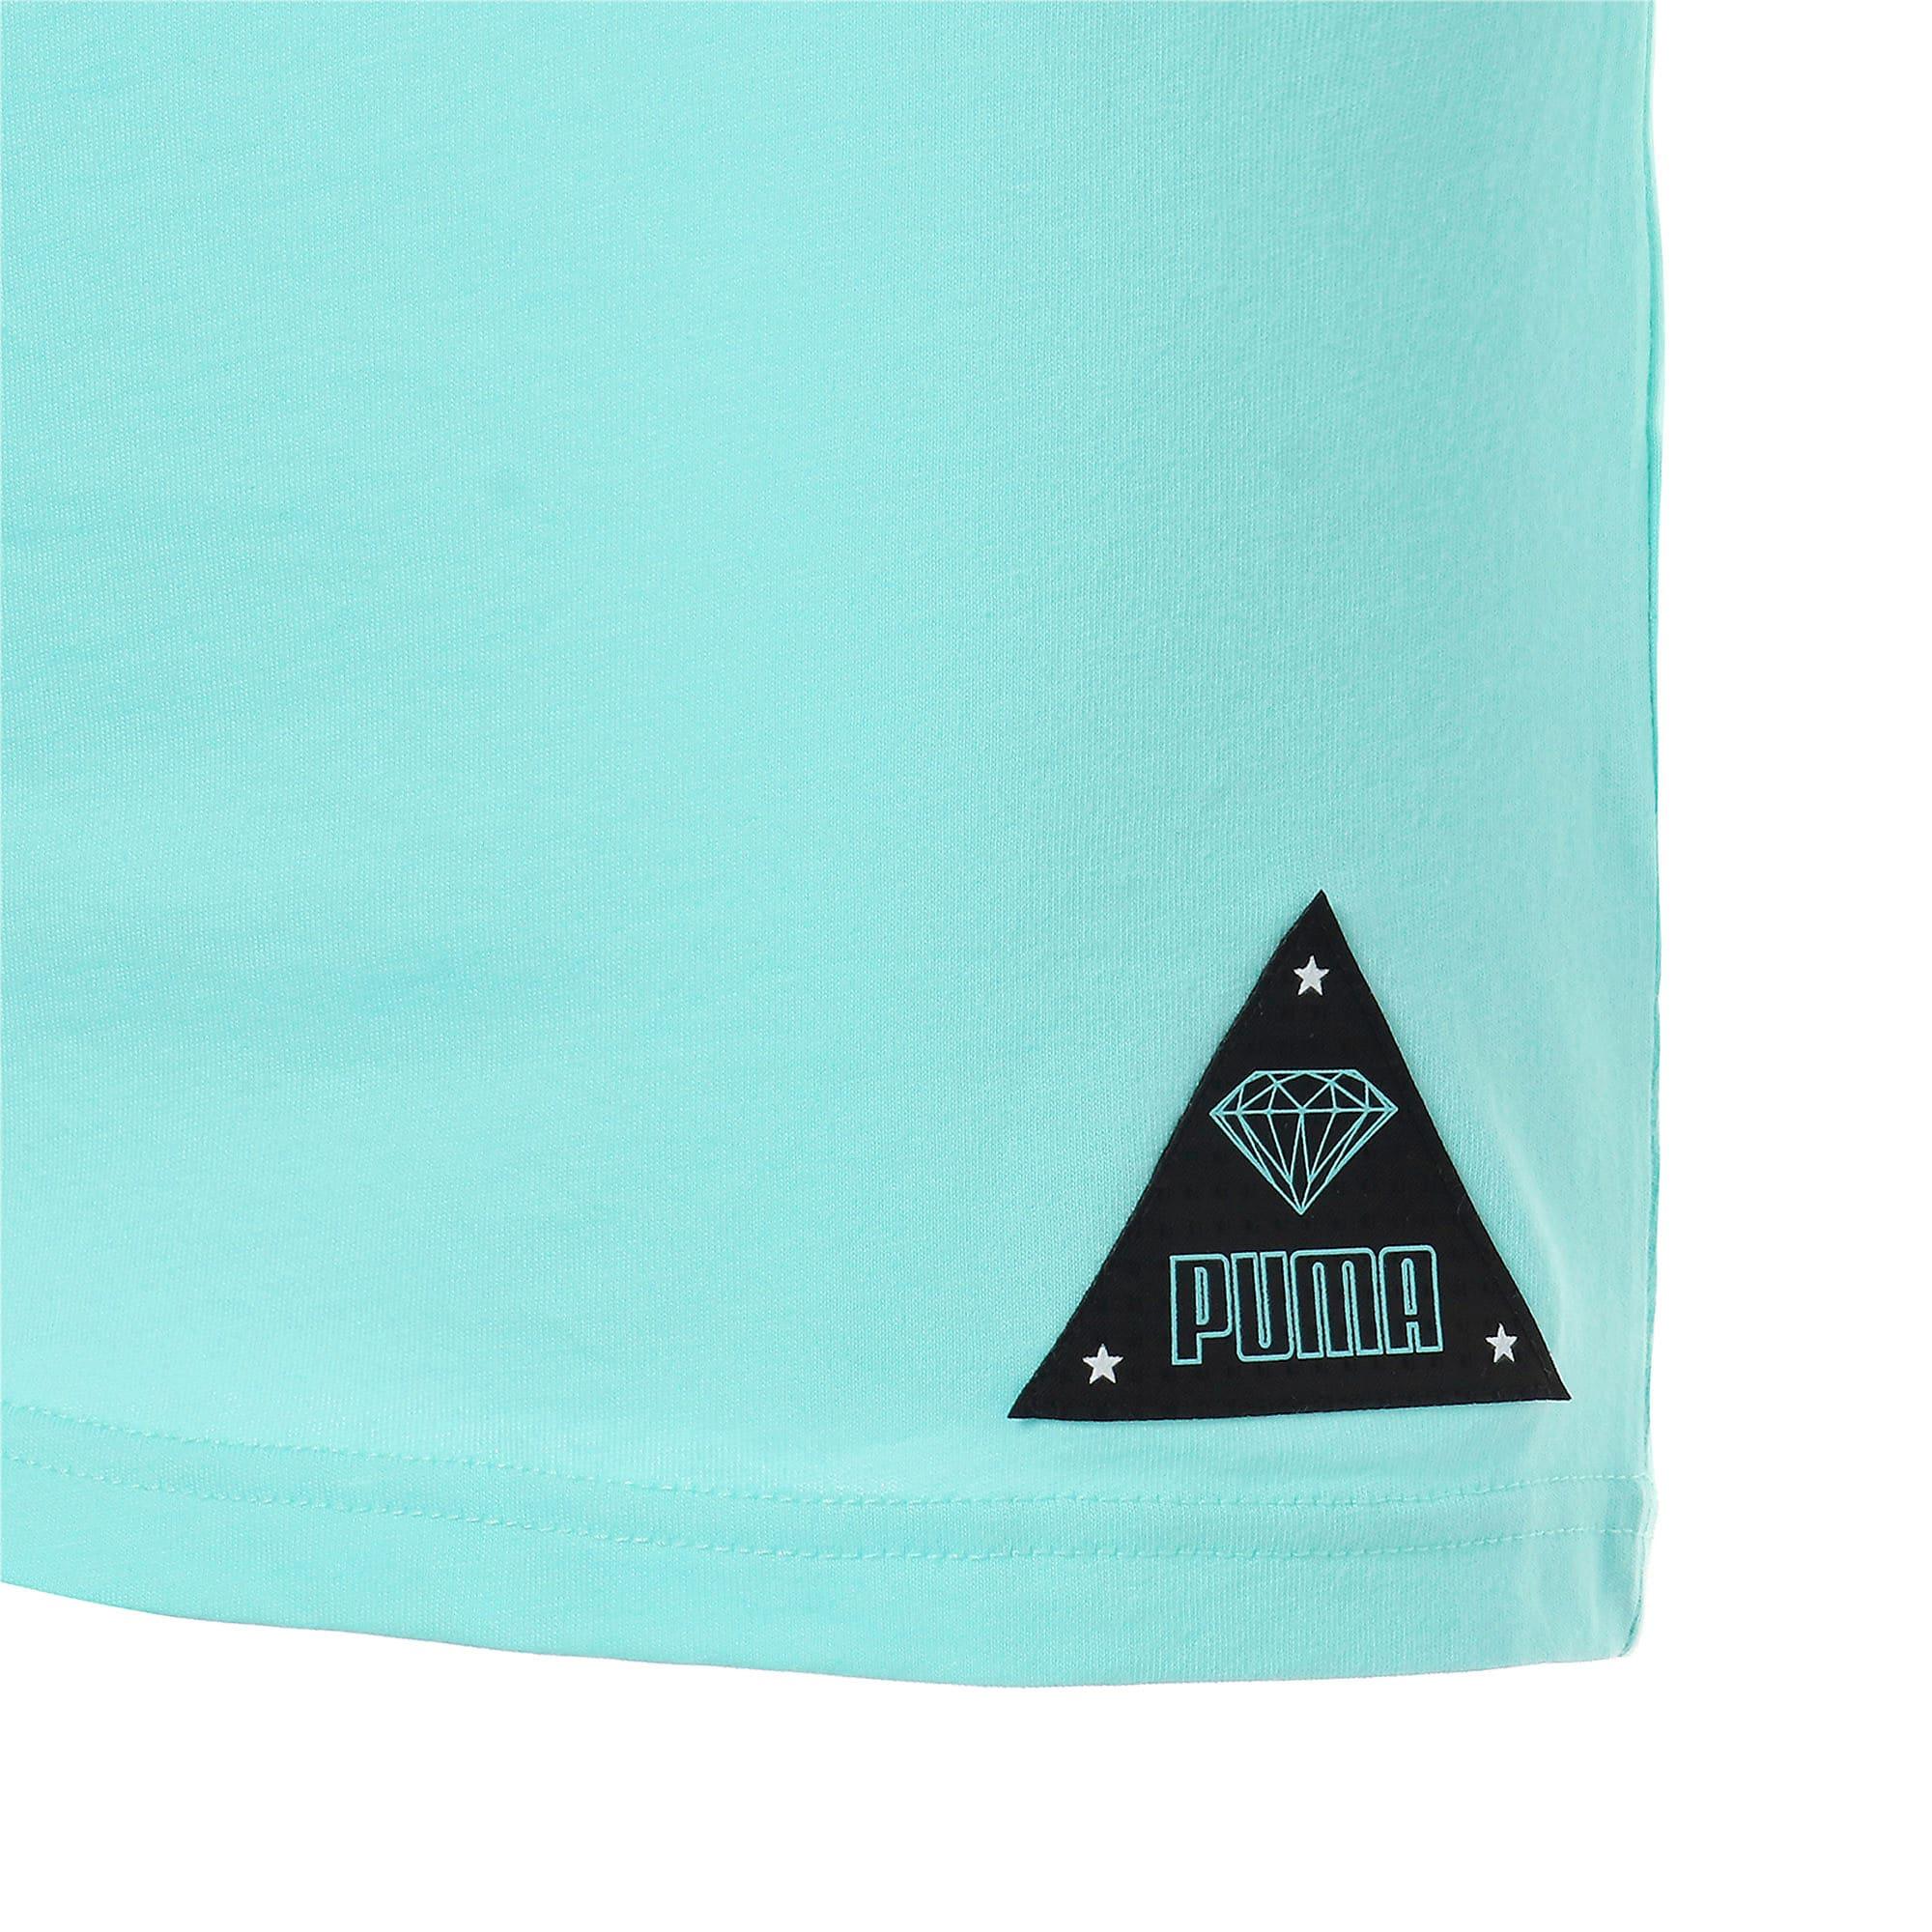 Thumbnail 9 of PUMA x DIAMOND Tシャツ, ARUBA BLUE, medium-JPN